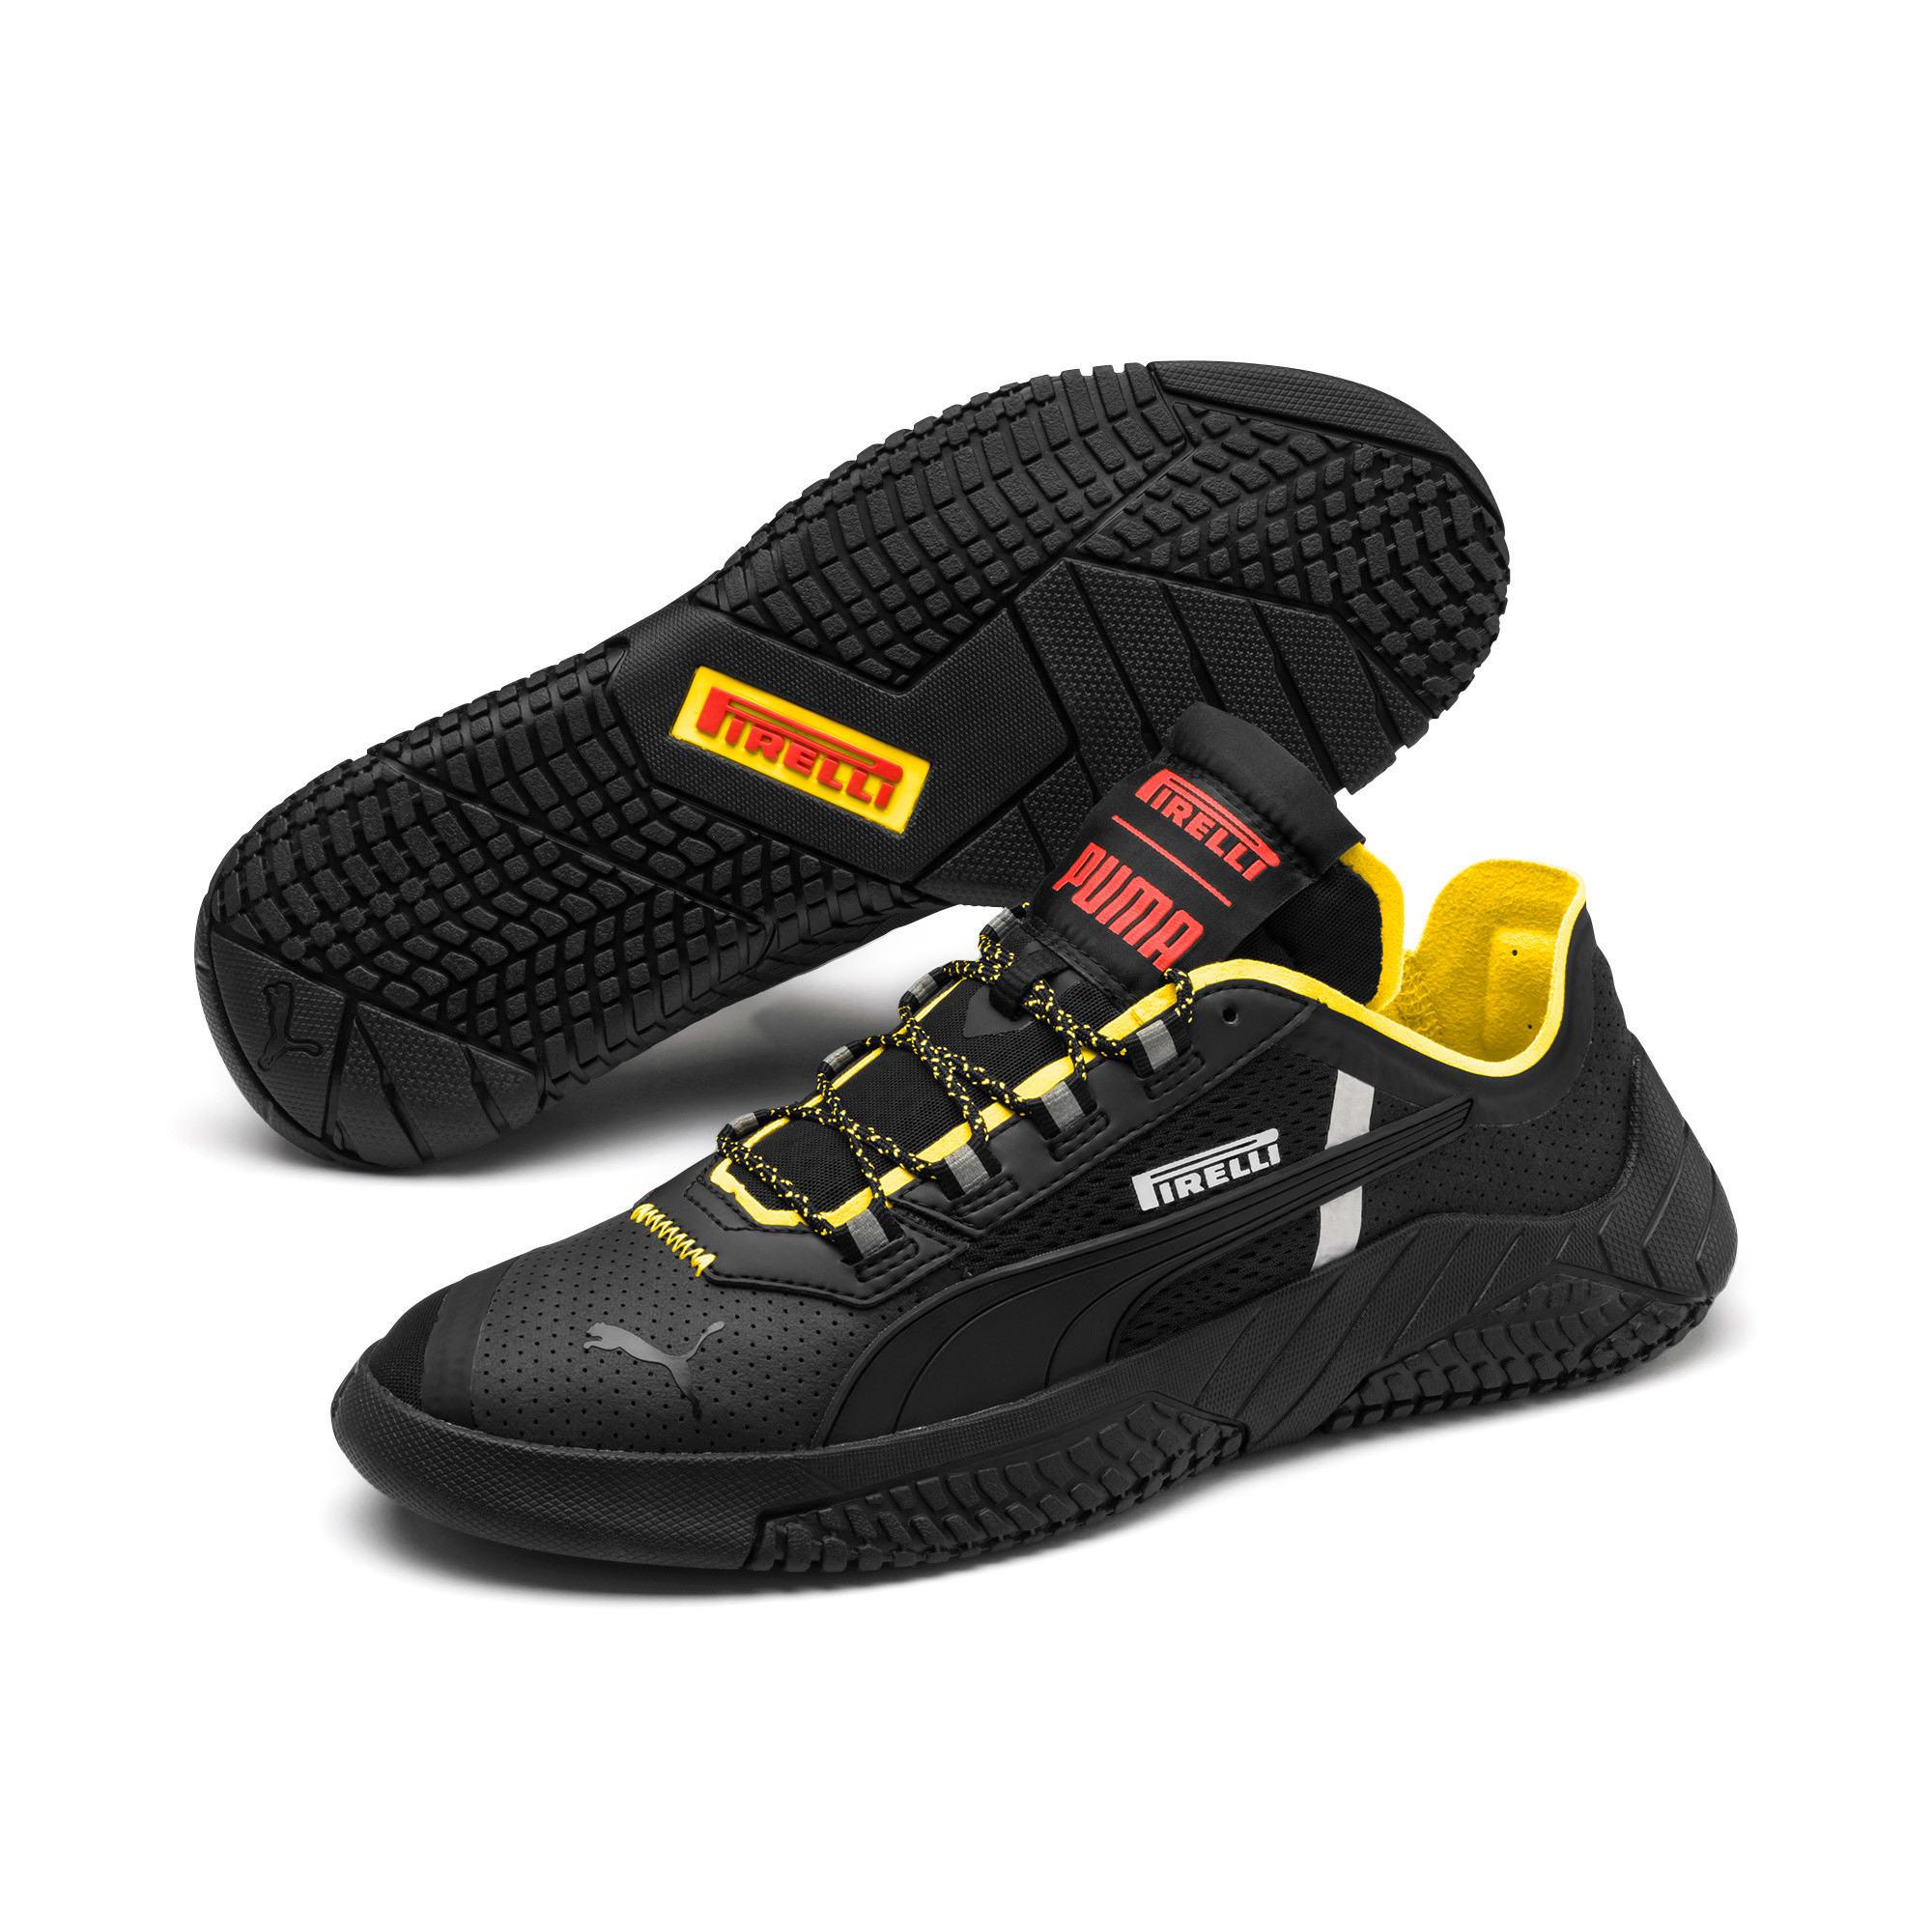 Thumbnail 2 of Pirelli Replicat-X Trainers, Black-Black-Cyber Yellow, medium